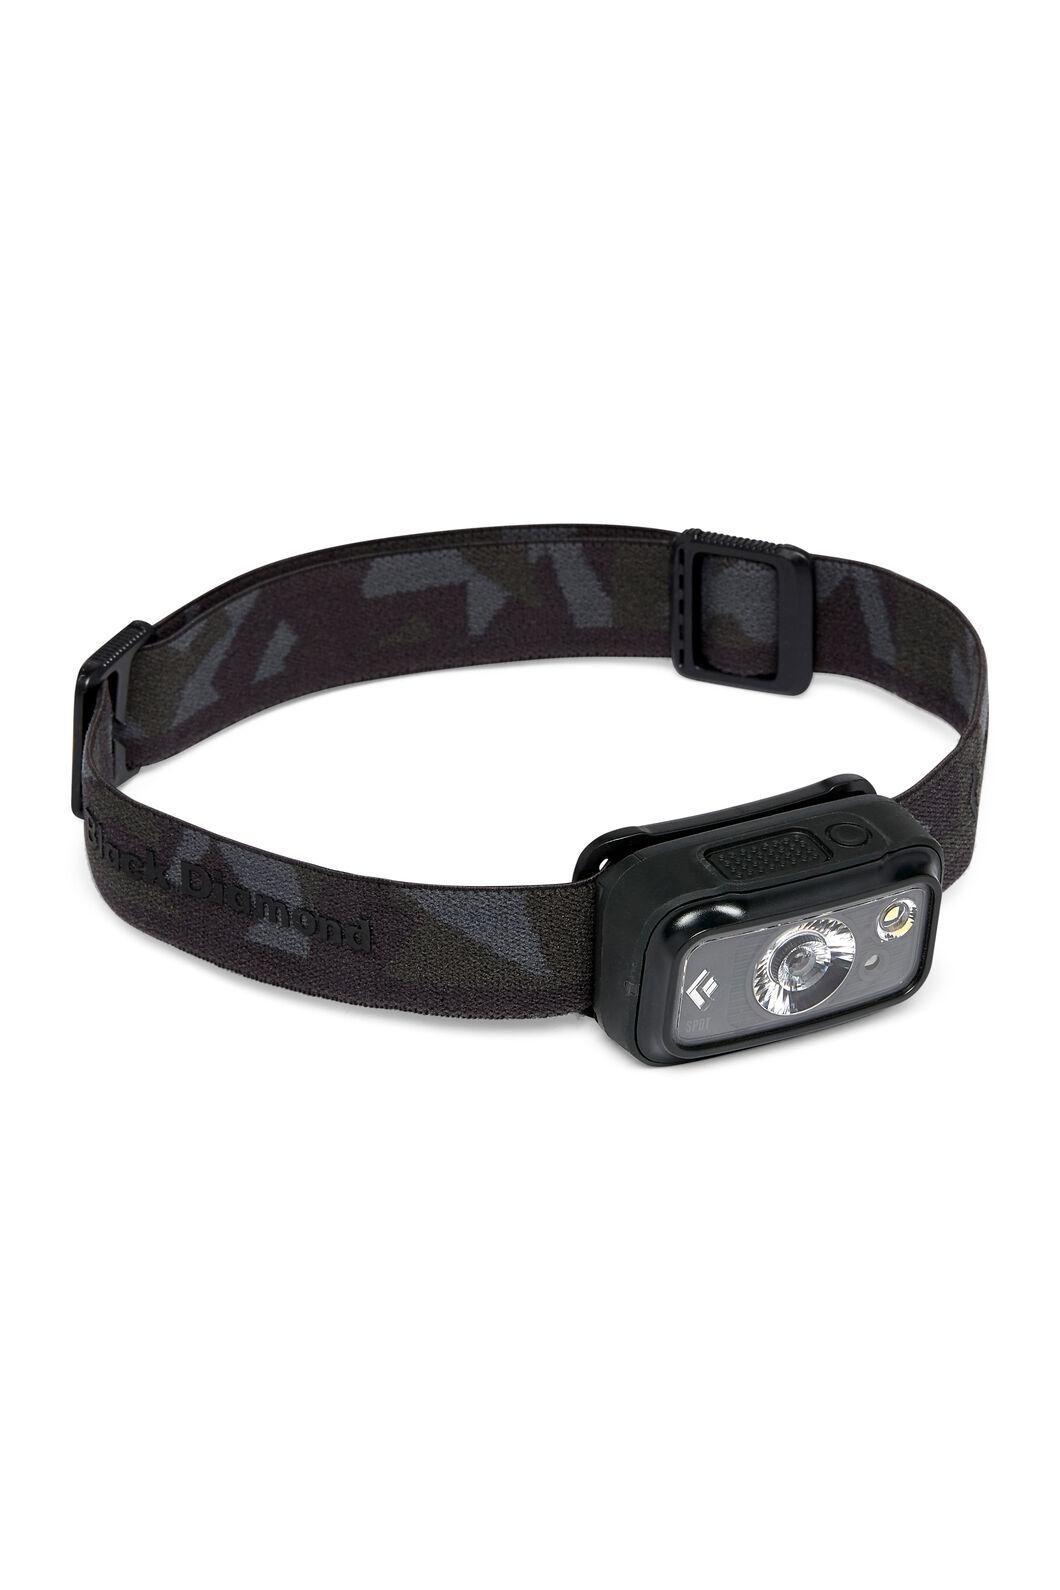 Black Diamond Spot 350 Headlamp, Black, hi-res